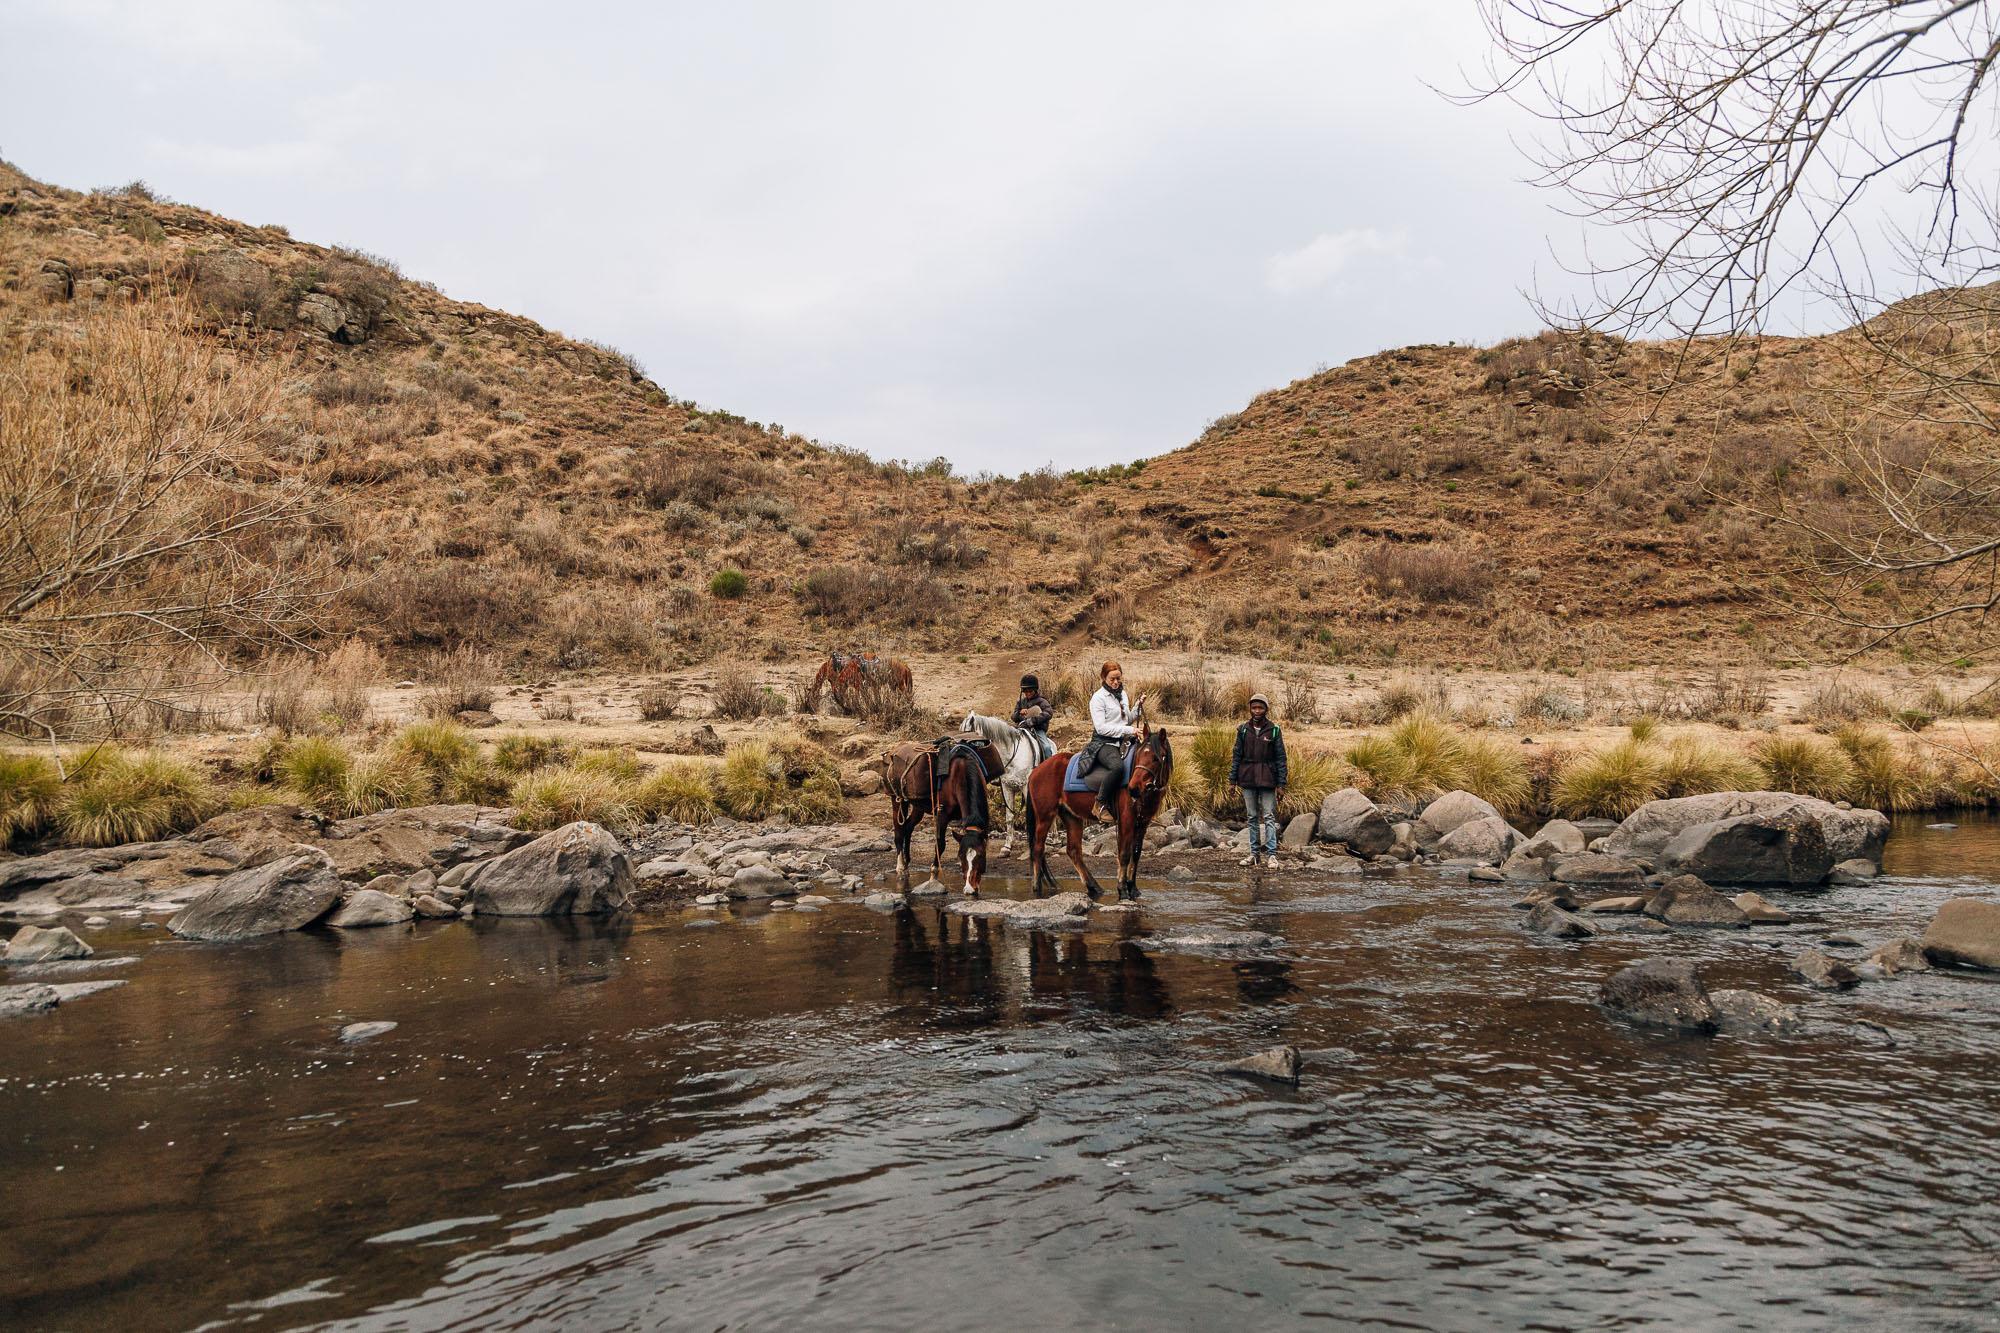 Keeping dry crossing the Ketane River